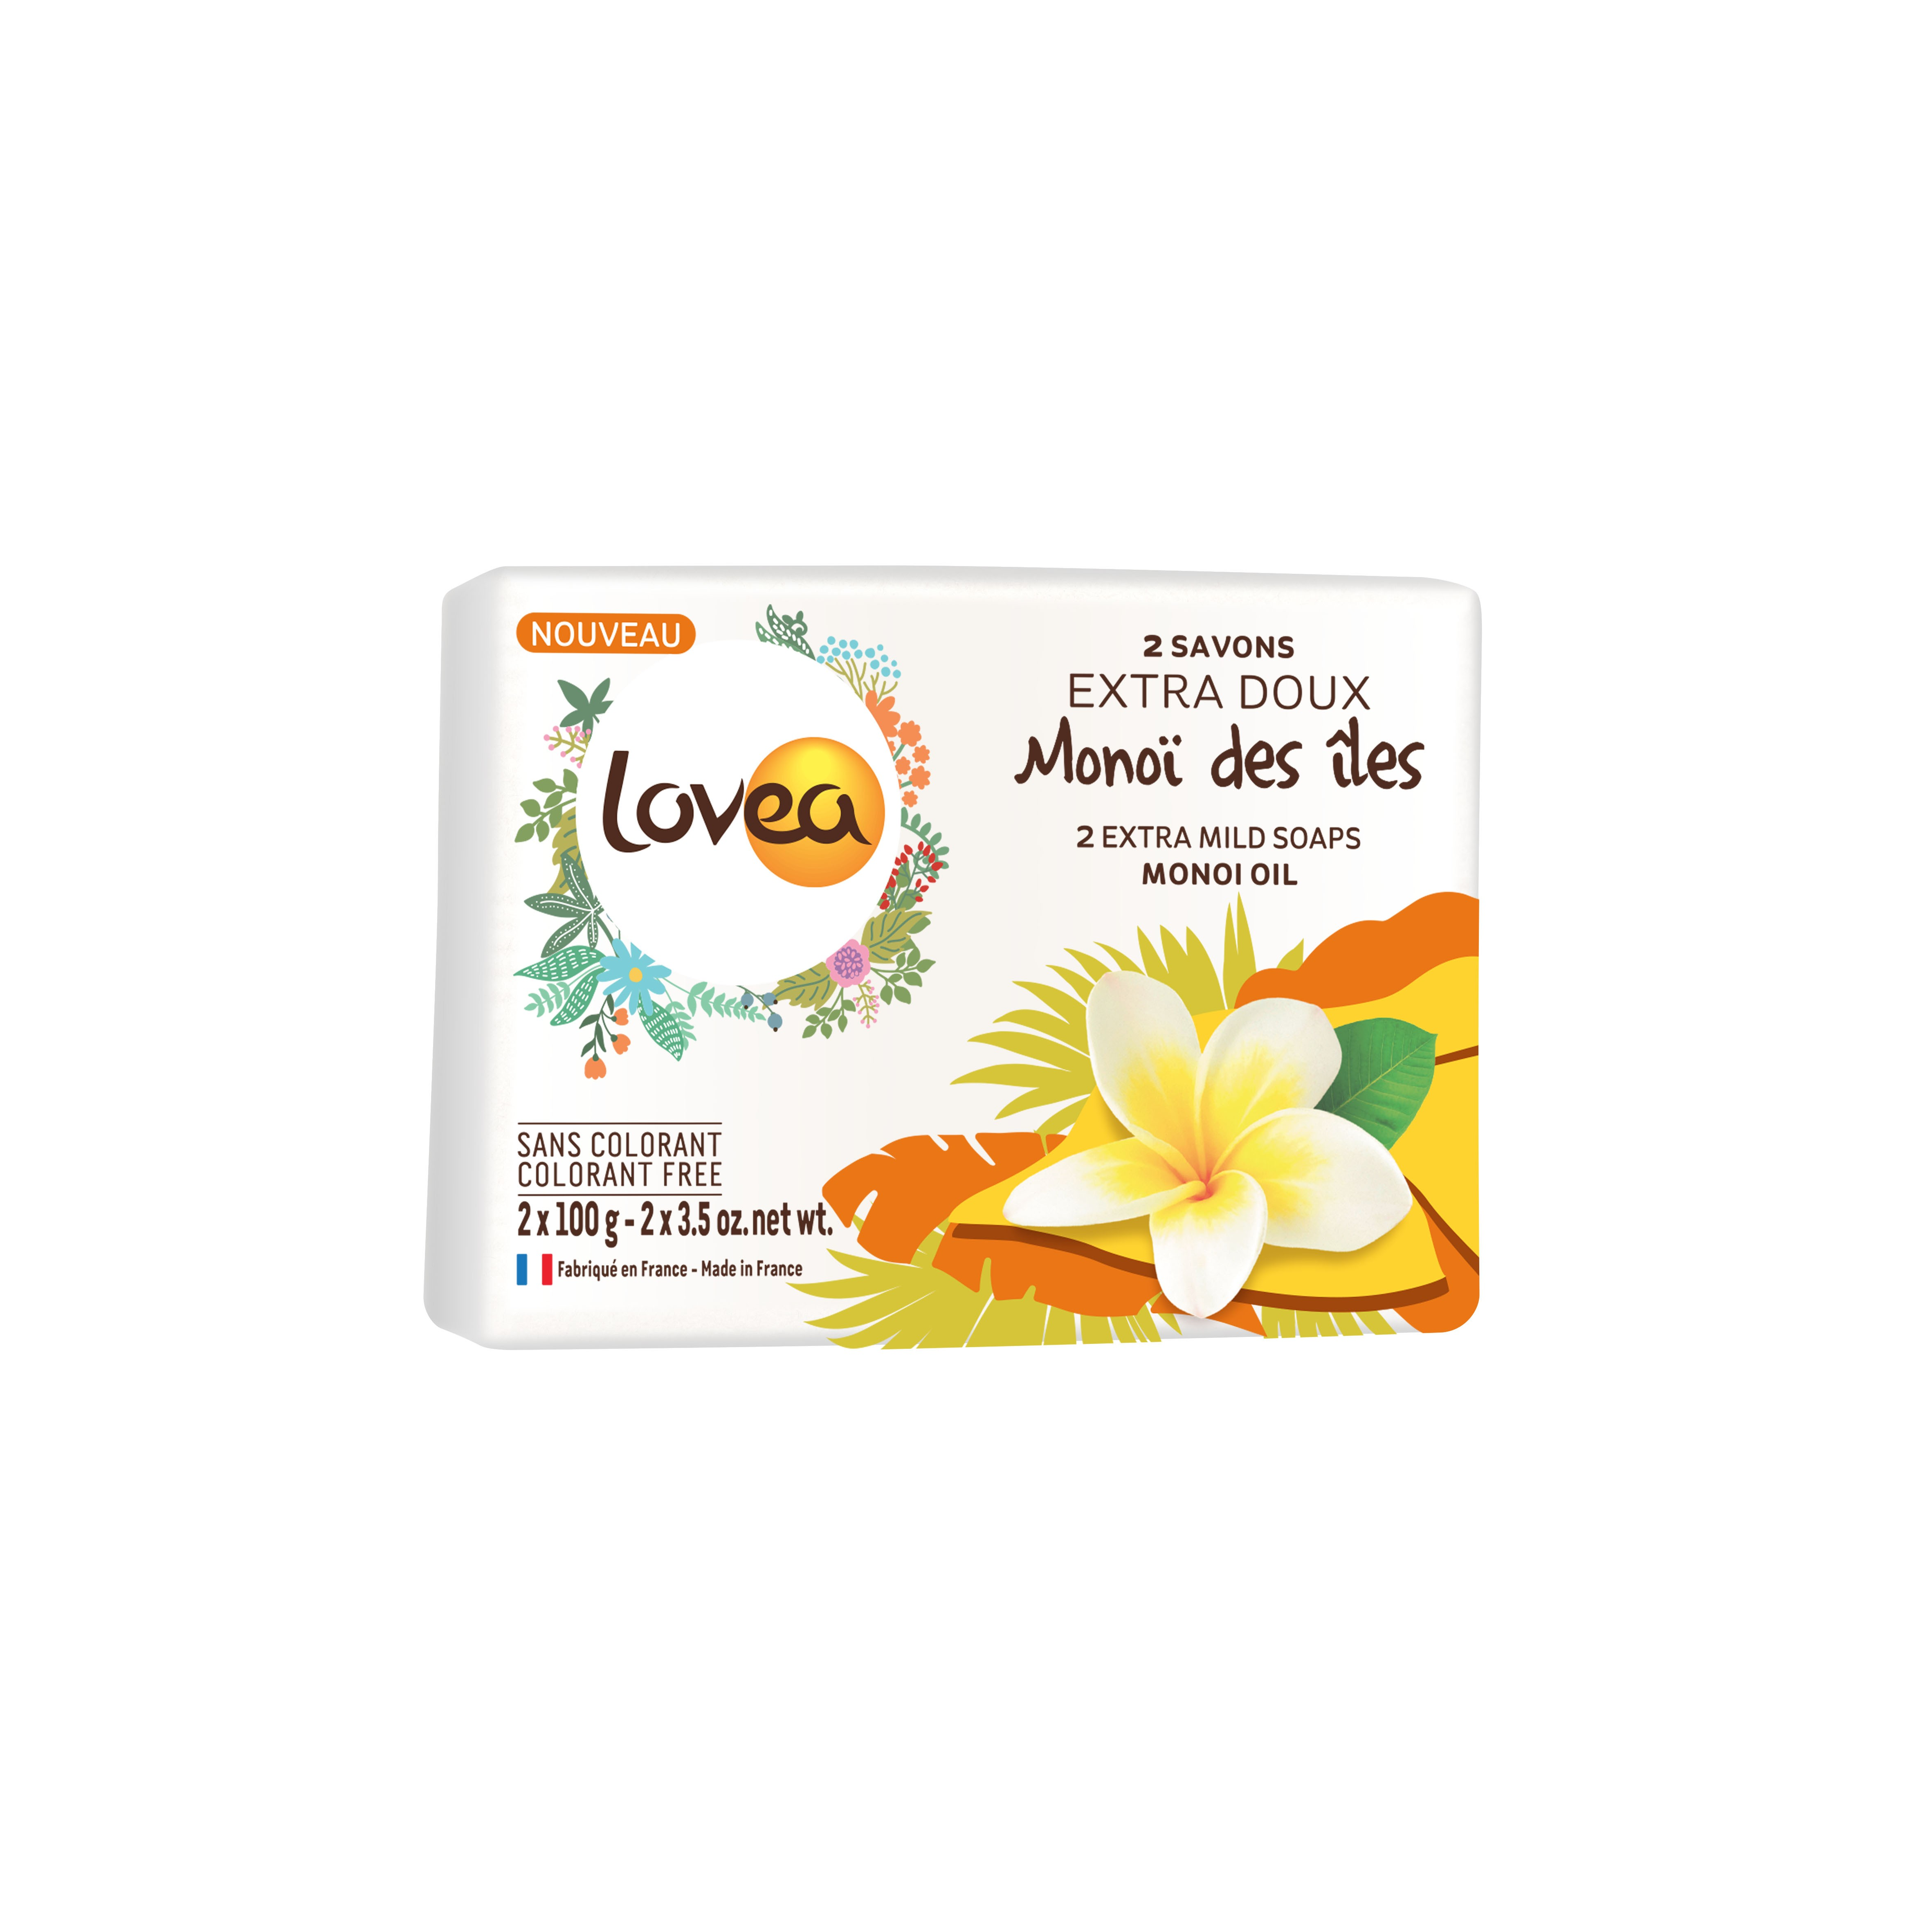 Lovea大溪地梔子花溫和香皂 2x100g